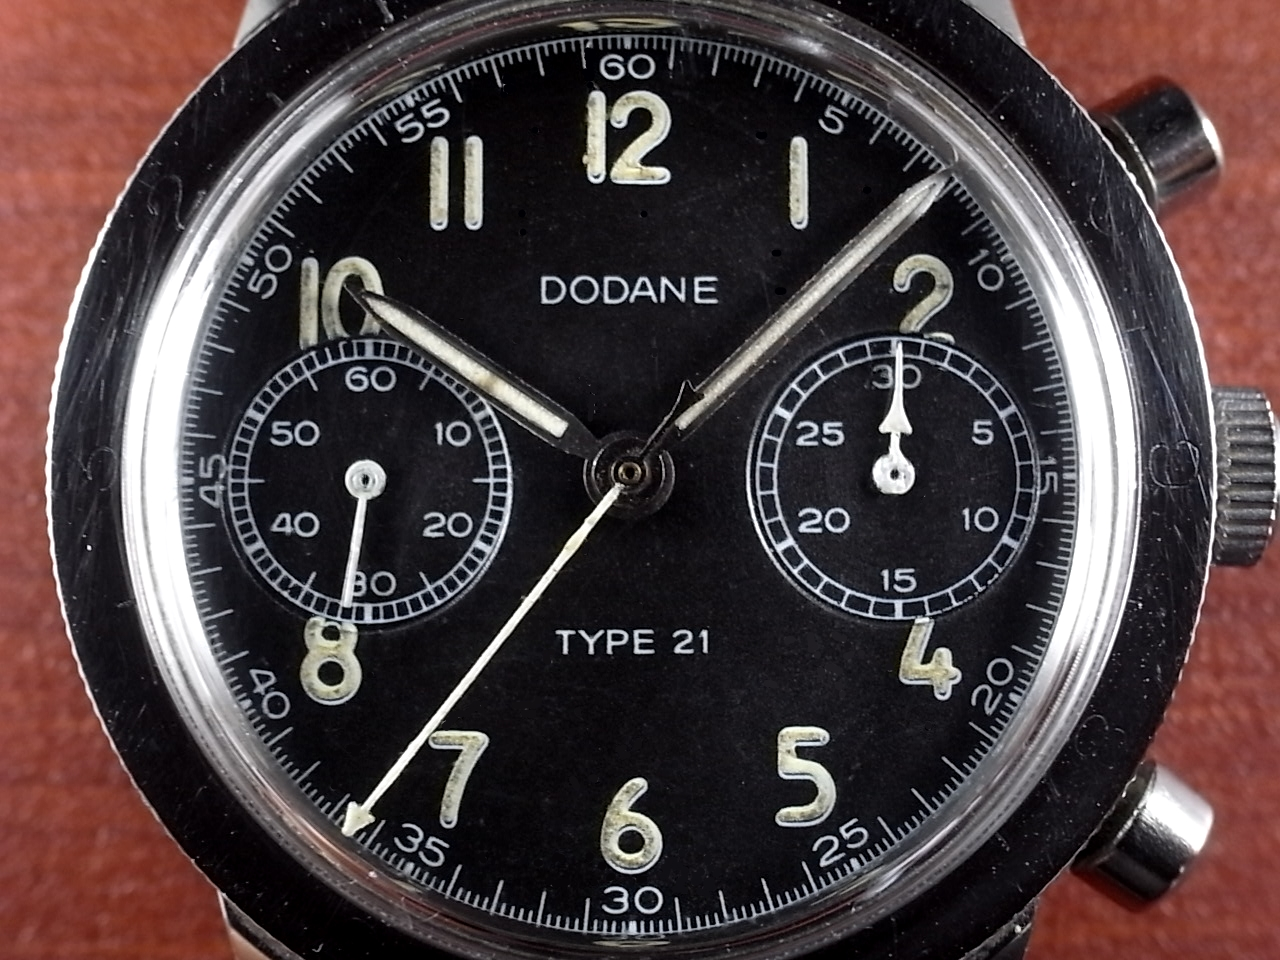 DODANE ドダンヌ  Type21 フランス空軍 クロノグラフ 1960年代の写真2枚目